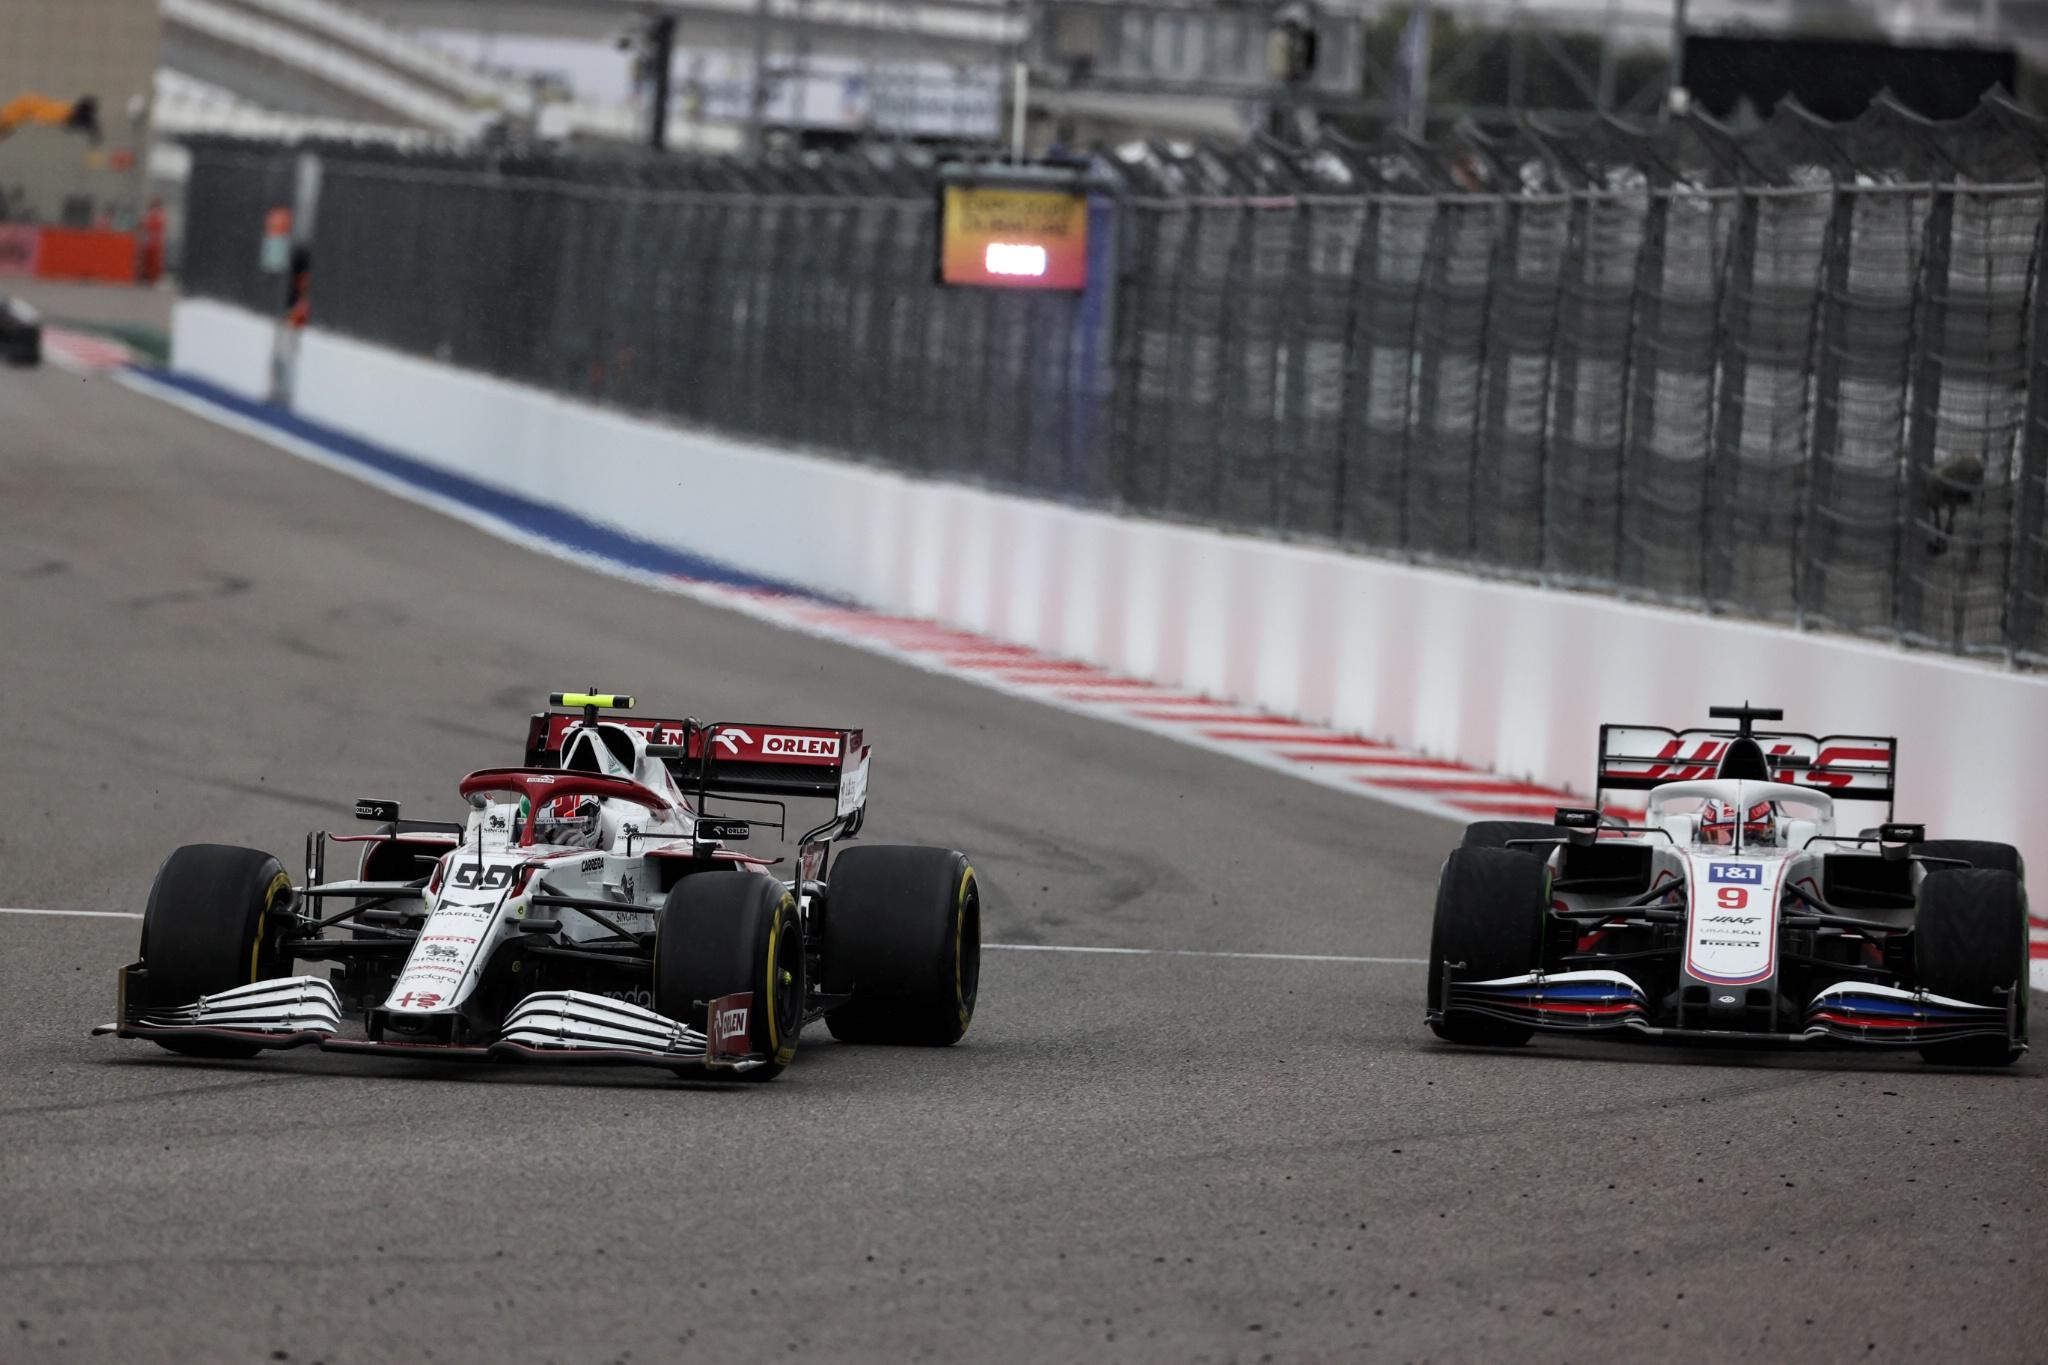 Antonio Giovinazzi (ITA) Alfa Romeo Racing C41 and Nikita Mazepin (RUS) Haas F1 Team VF-21 battle for position.